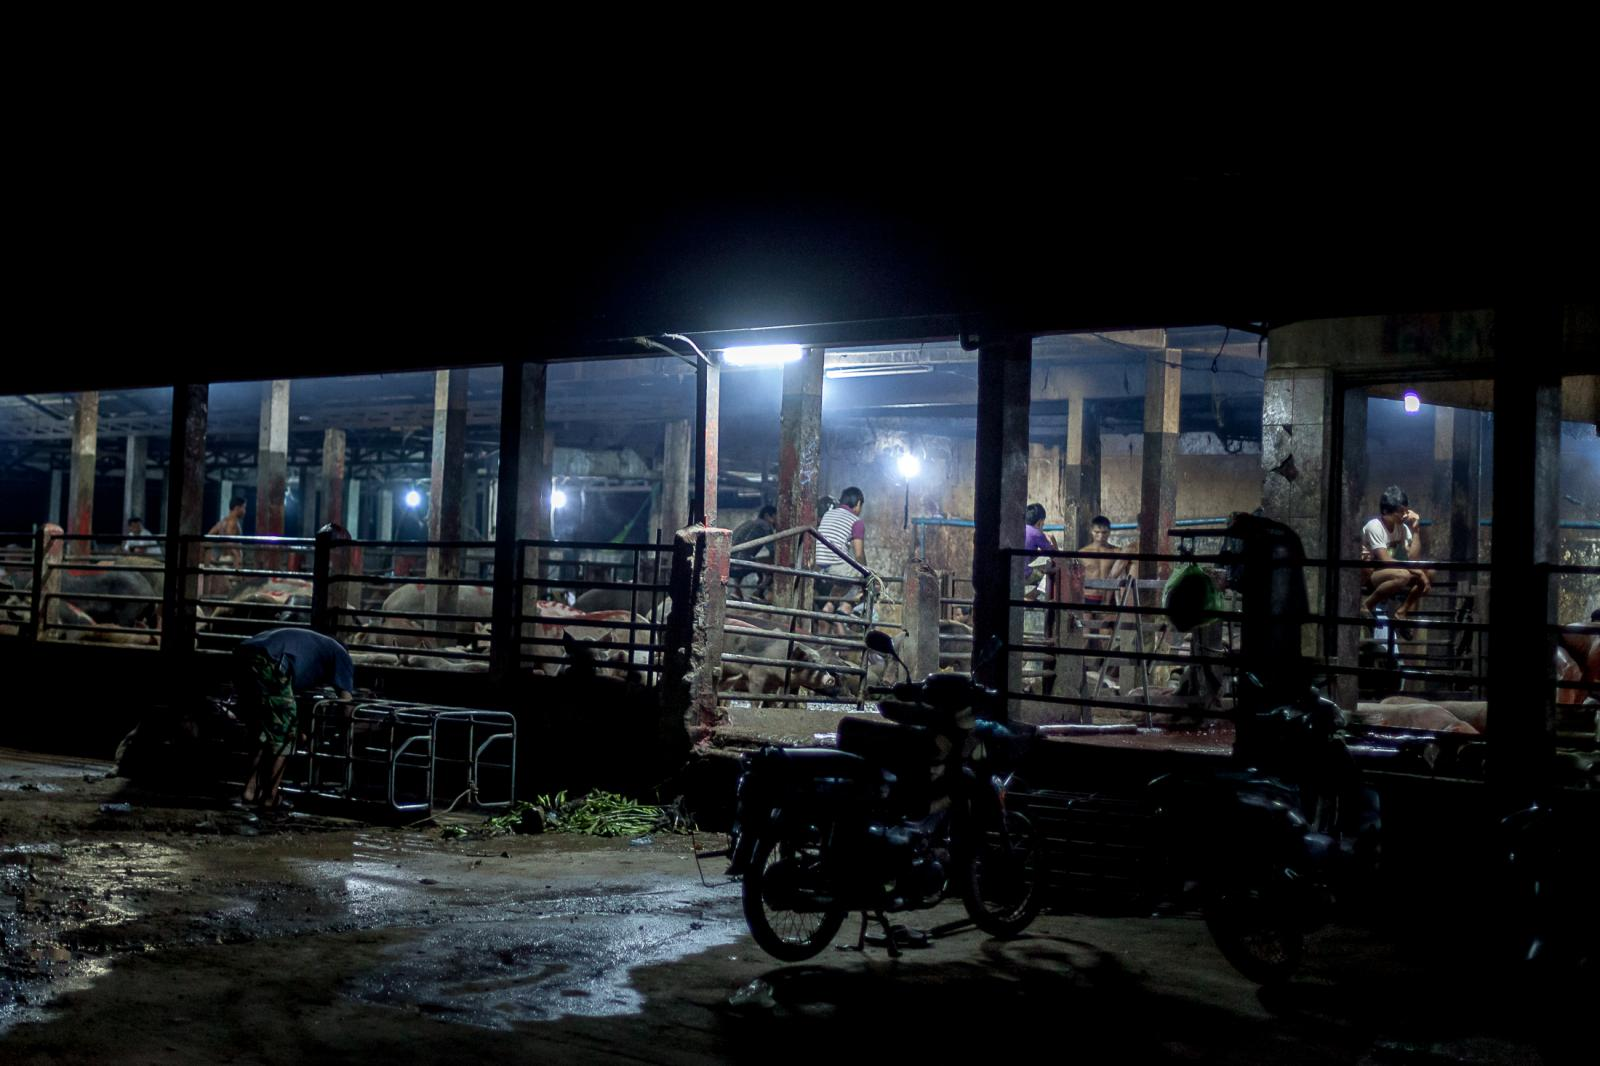 Photography image - Loading 001_Slaughterhouse-Cambodia-Omar-Havana.jpg